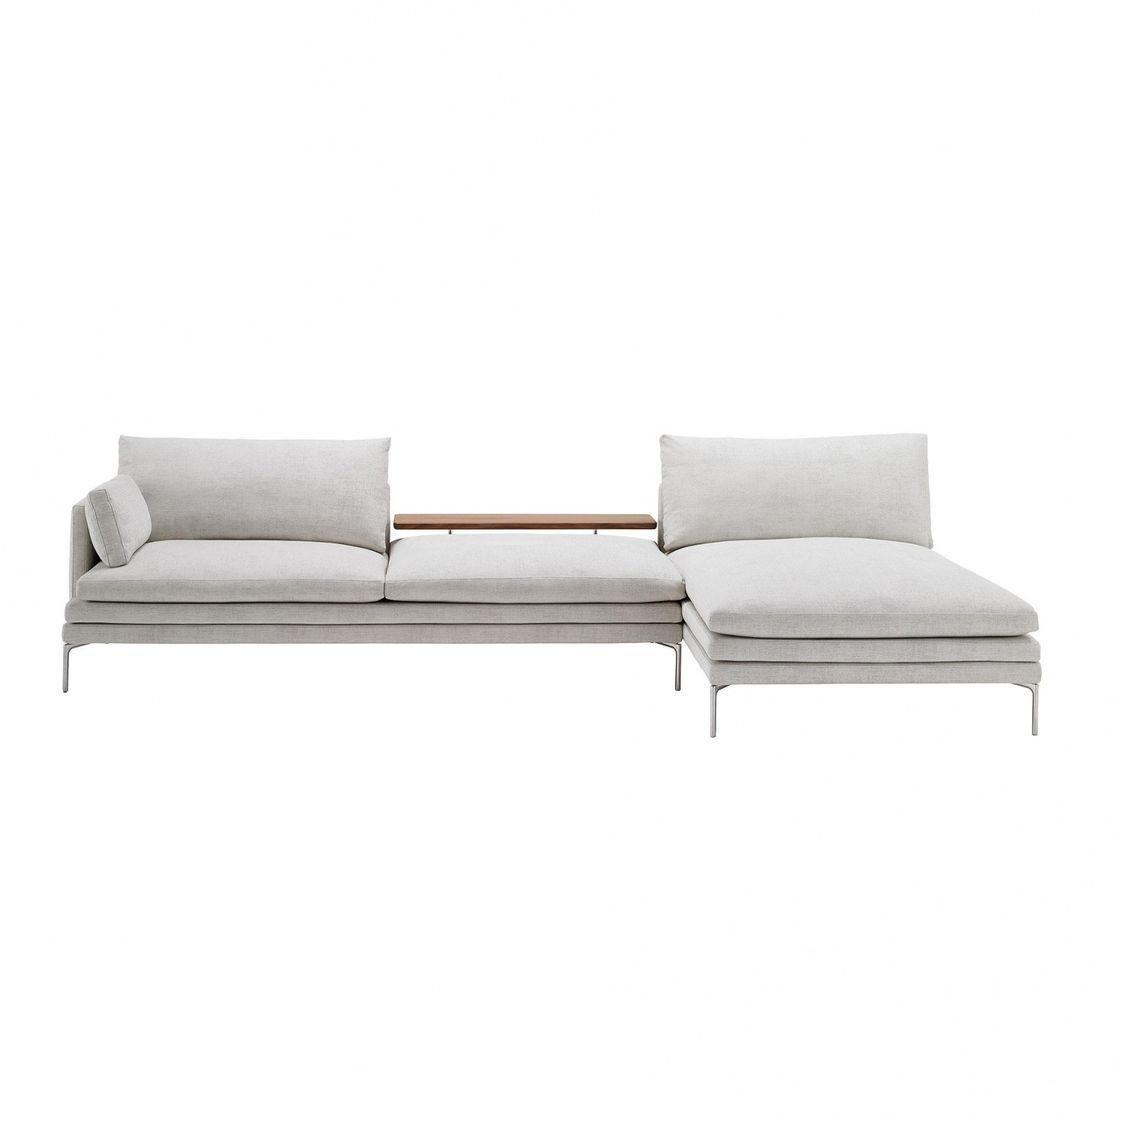 william sofa with chaise longue zanotta. Black Bedroom Furniture Sets. Home Design Ideas